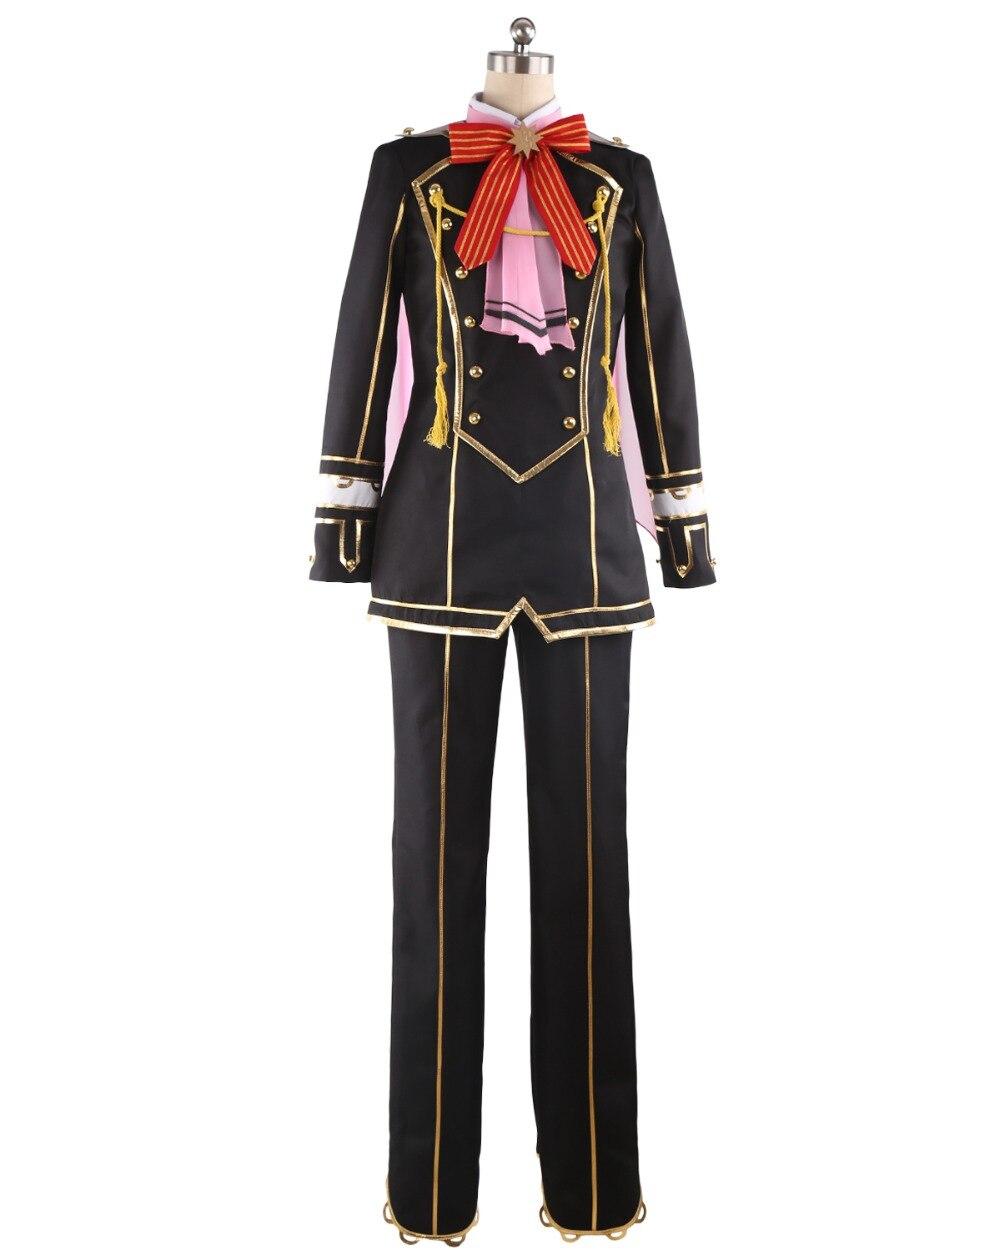 Idolish7 TRIGGER DIAMOND FUSION Kujo Tenn Cosplay Costume Custom Made